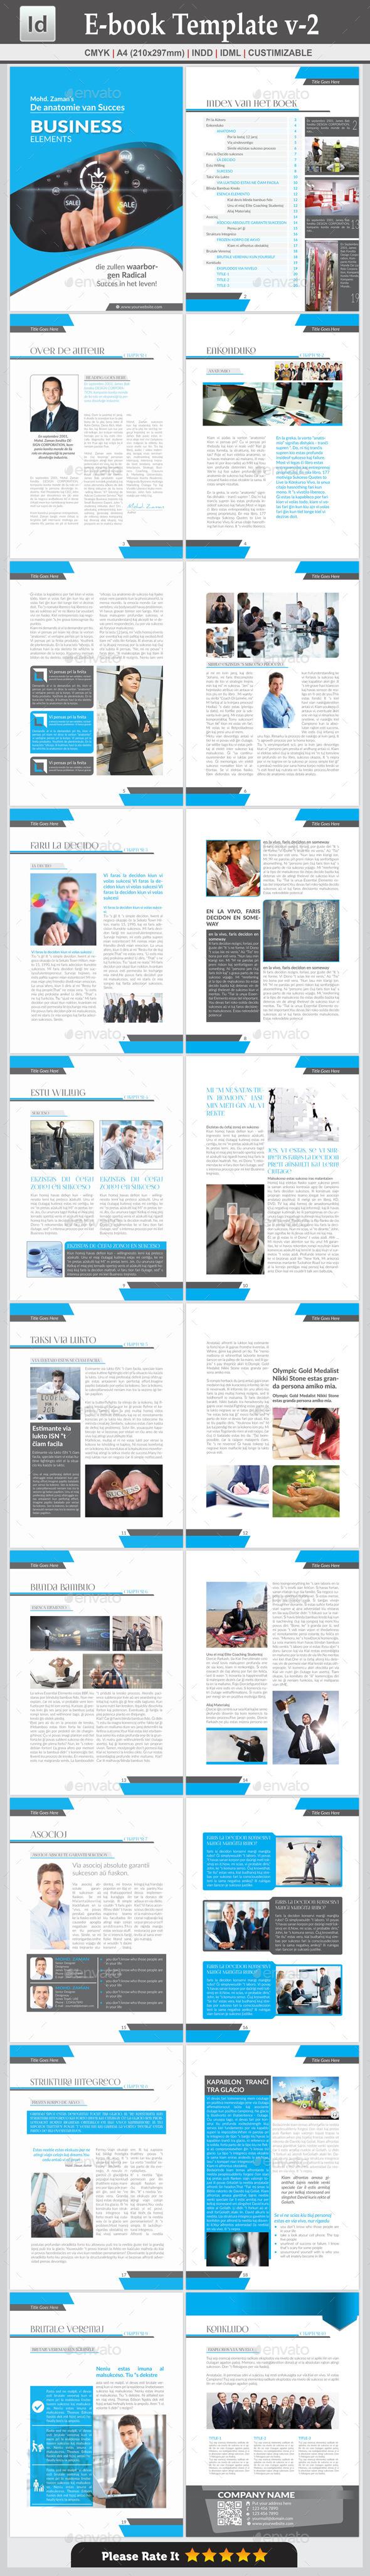 GraphicRiver E-book Template v-2 9807814